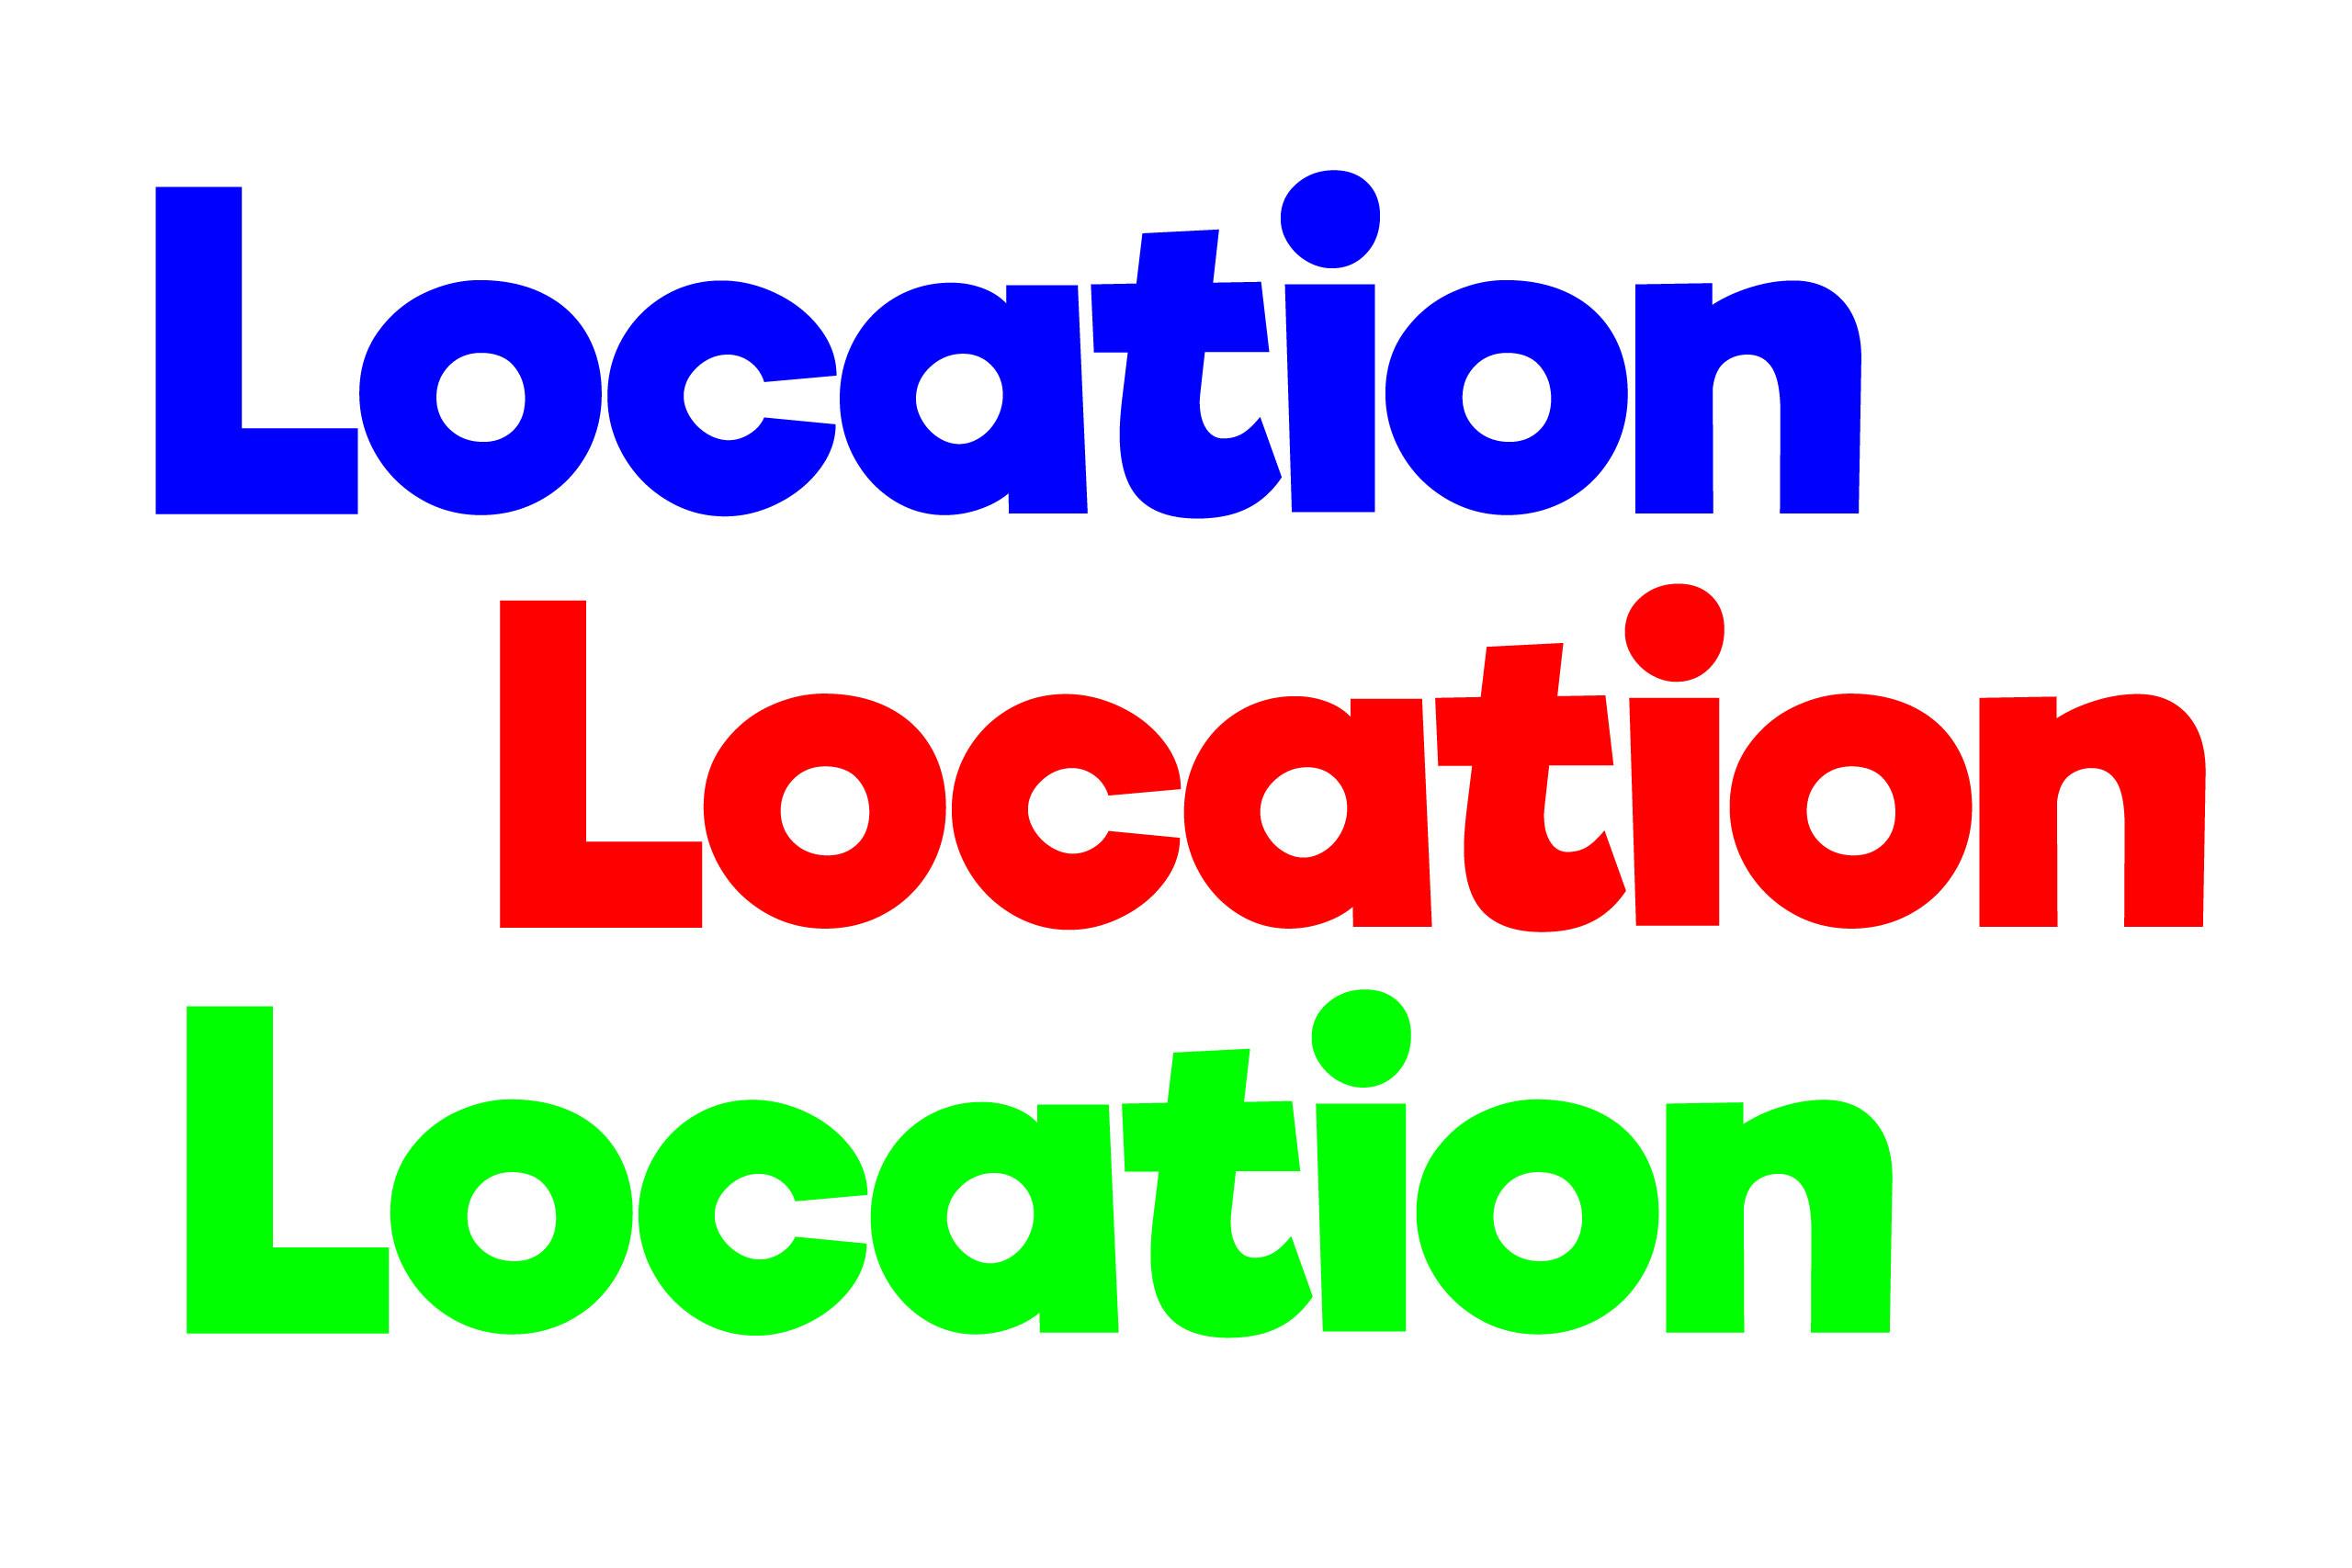 Location-location-location